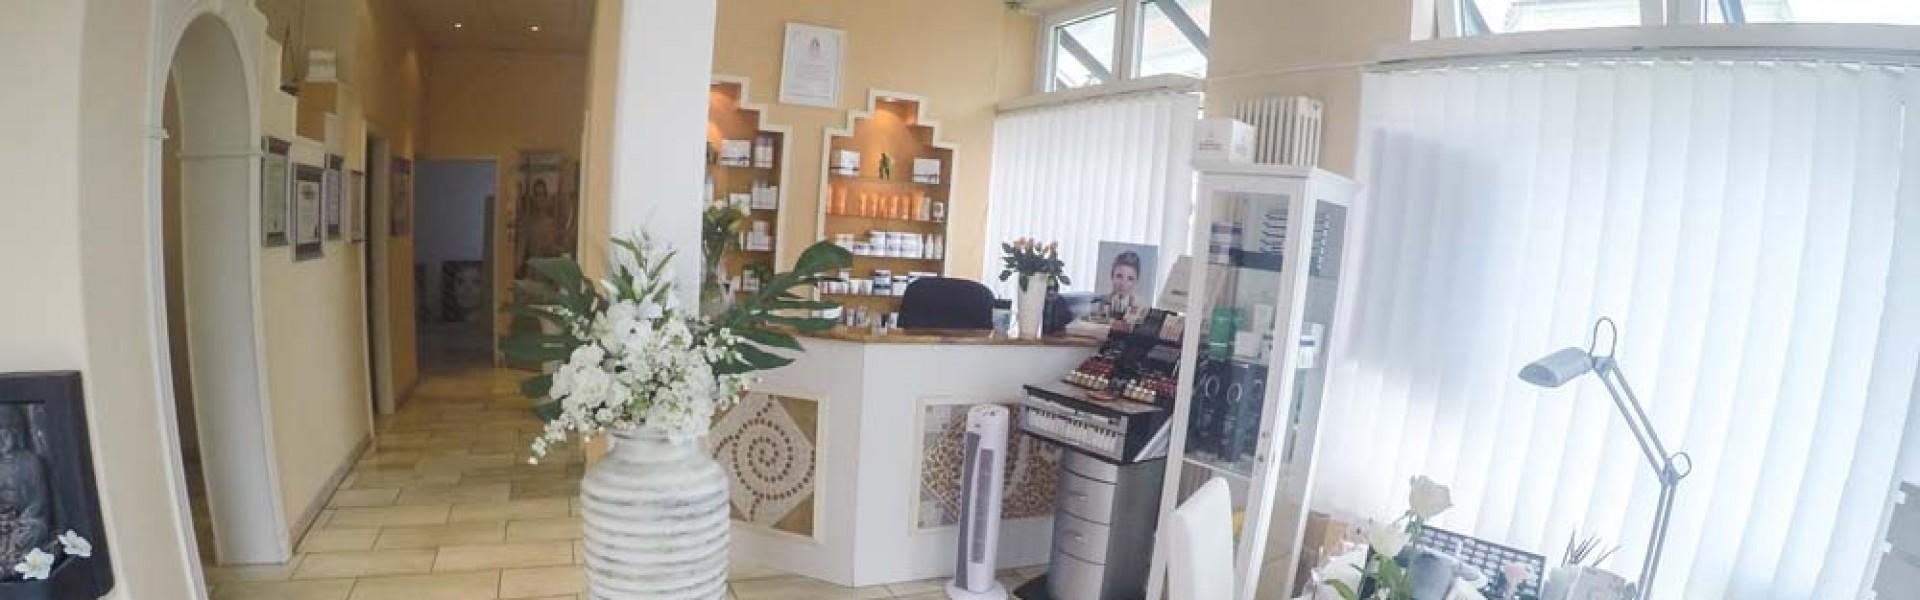 Kosmetikstudio Ferrie